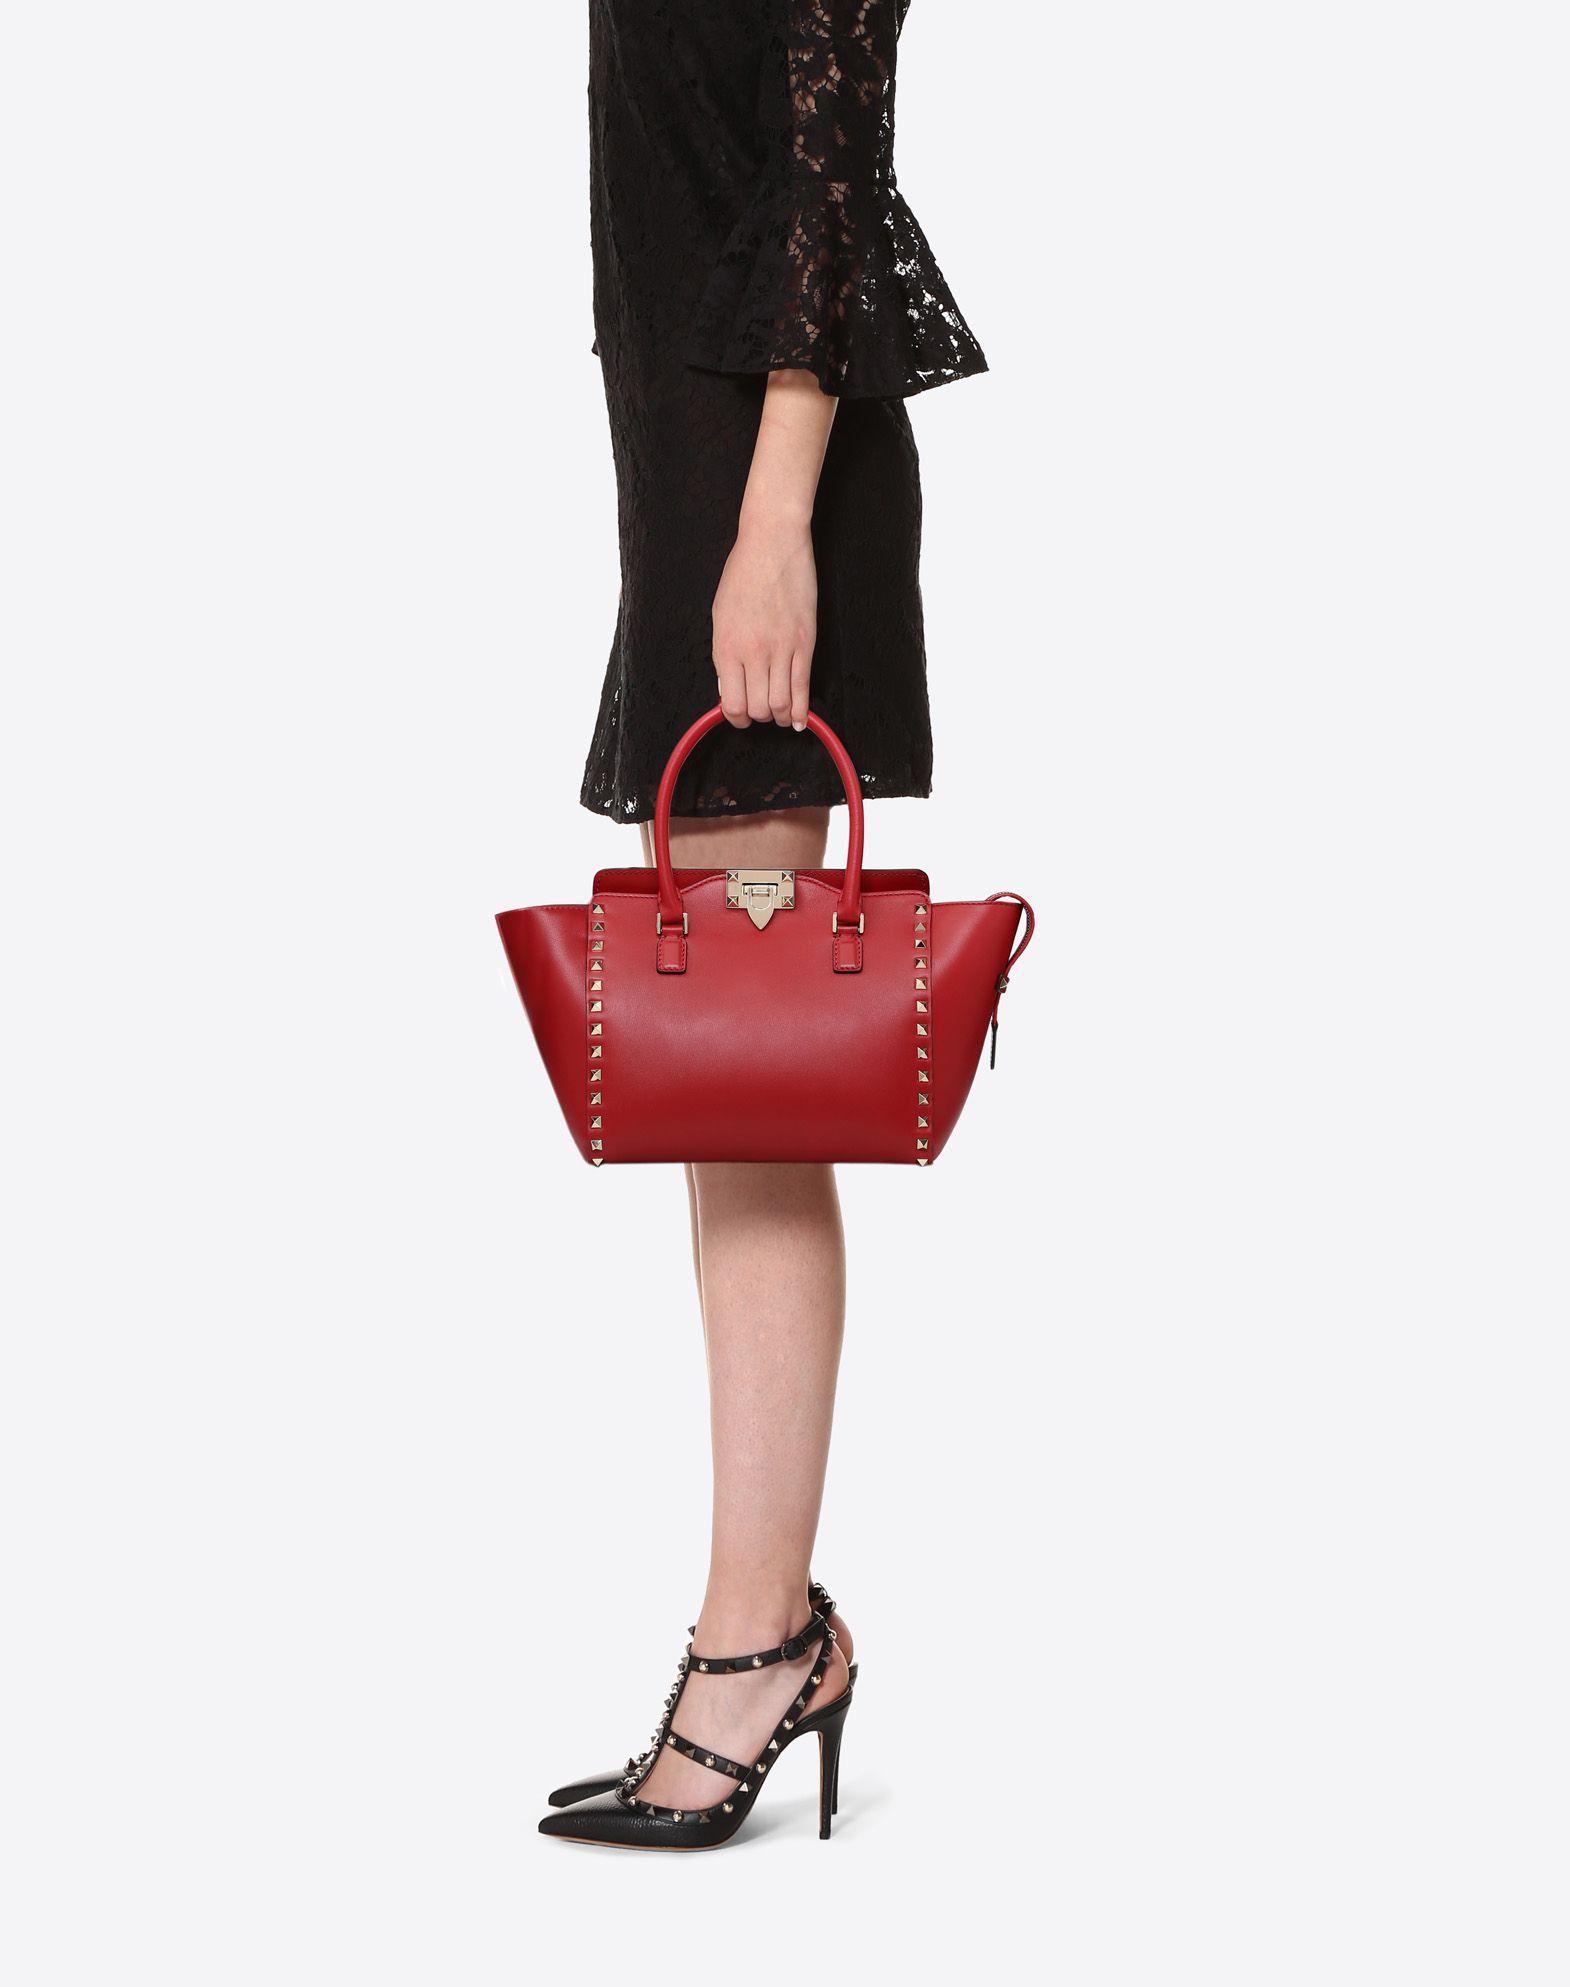 VALENTINO GARAVANI Rockstud Small Double Handle Bag HANDBAG D a